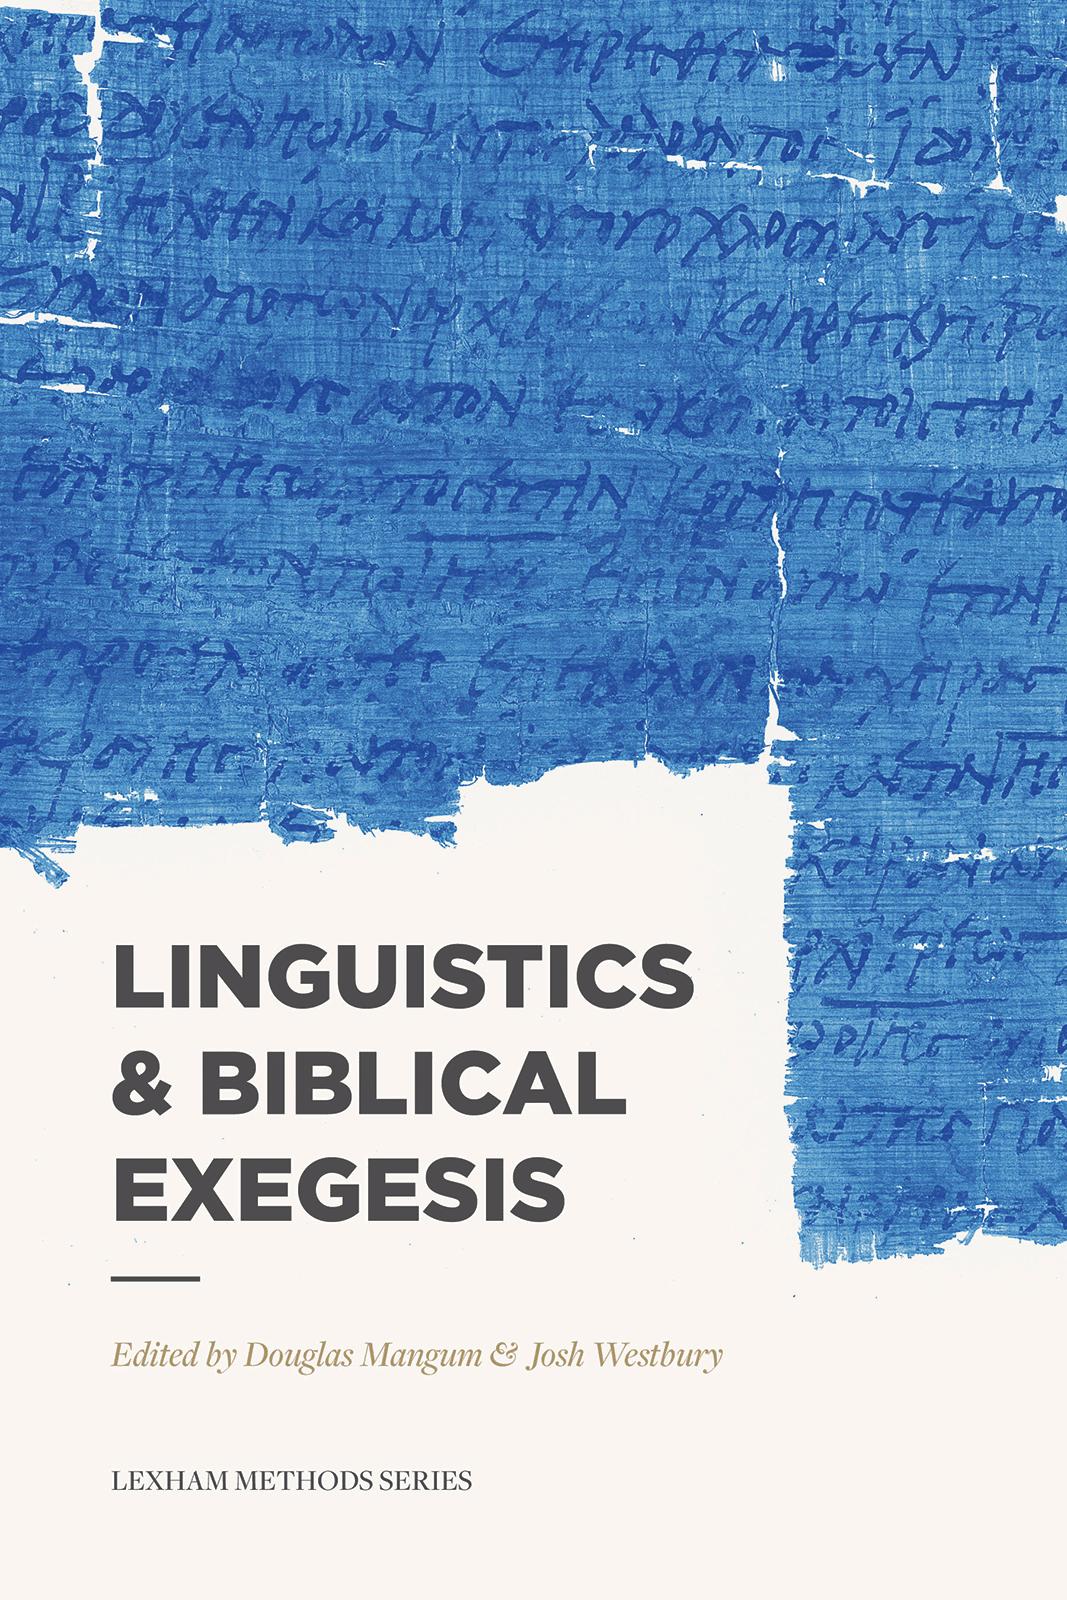 Linguistics and Biblical Exegesis